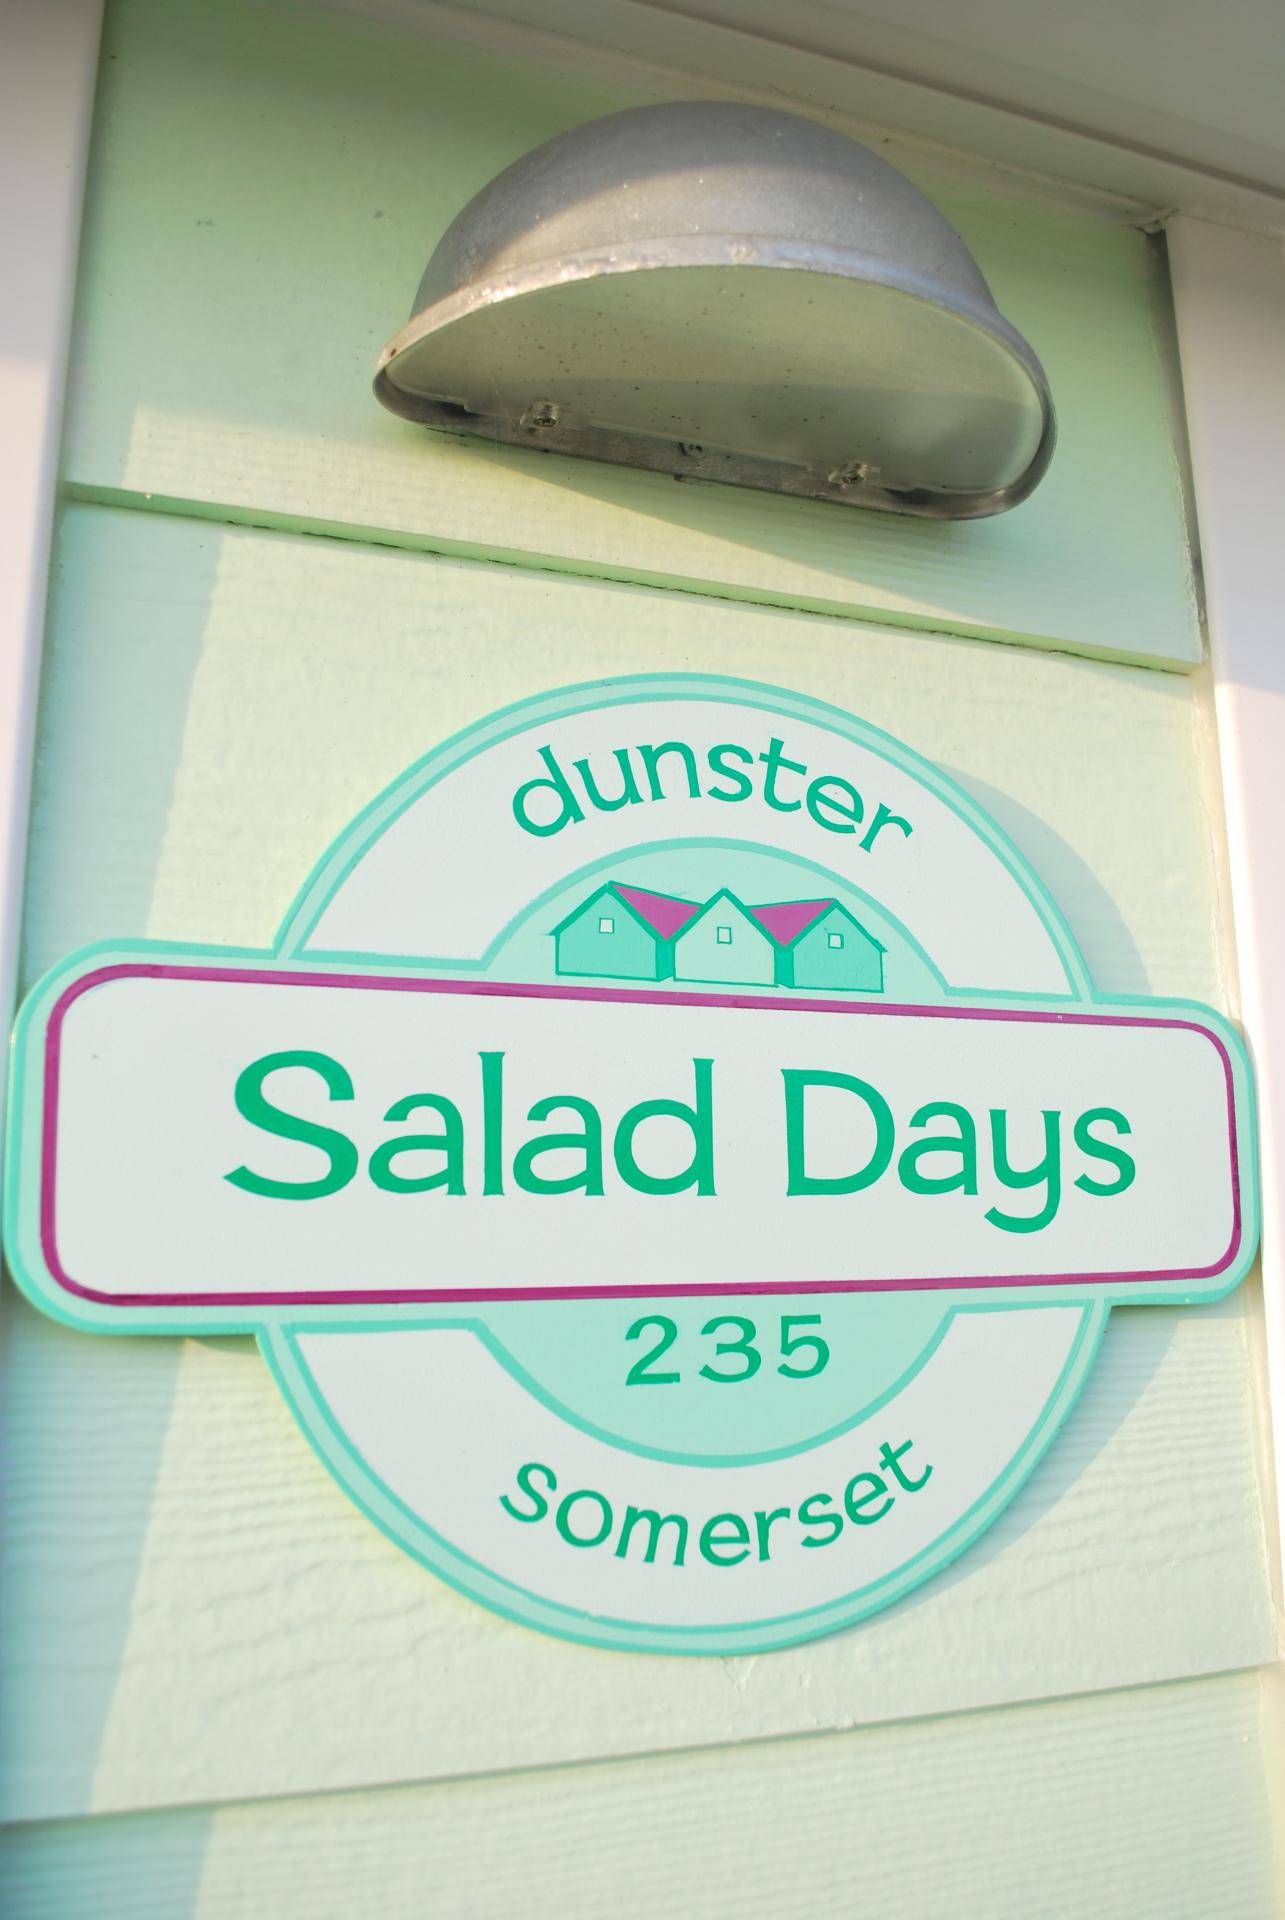 Dunster, luxury, Beach, hut, Salad, Days, sign, chalet, name